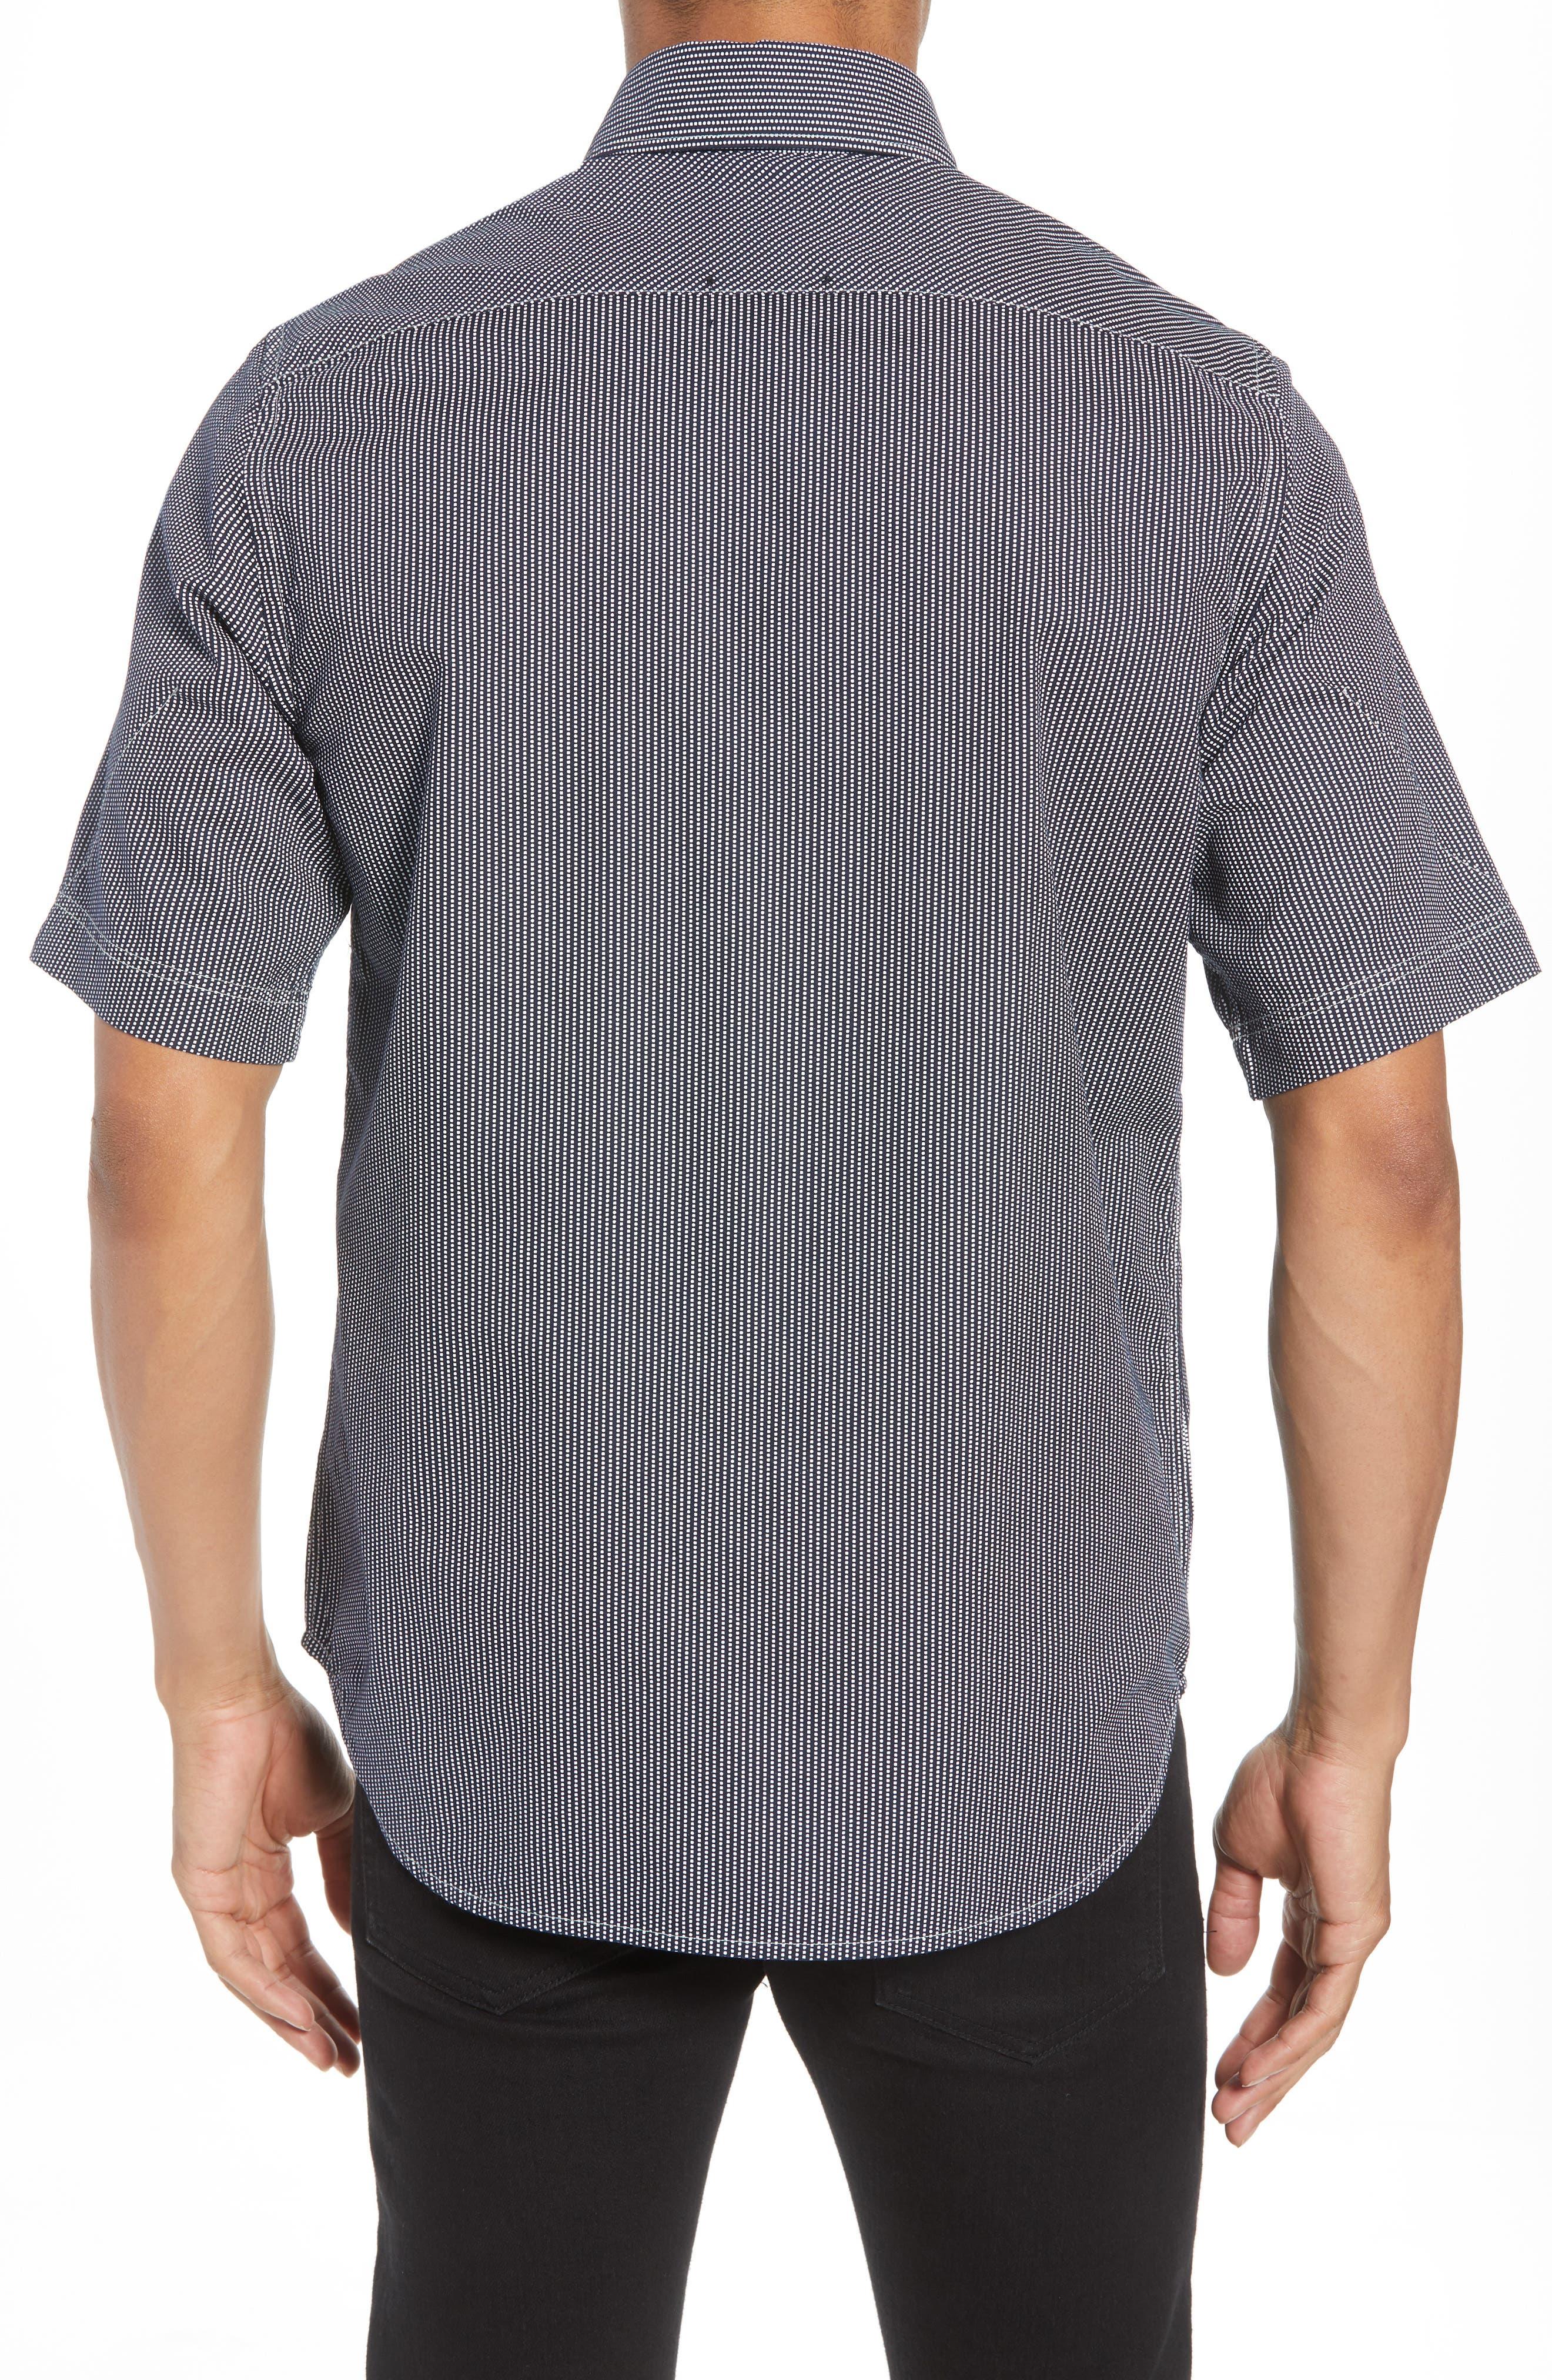 Bristum Straight Ref Shirt,                             Alternate thumbnail 2, color,                             Sartho Blue/ Milk